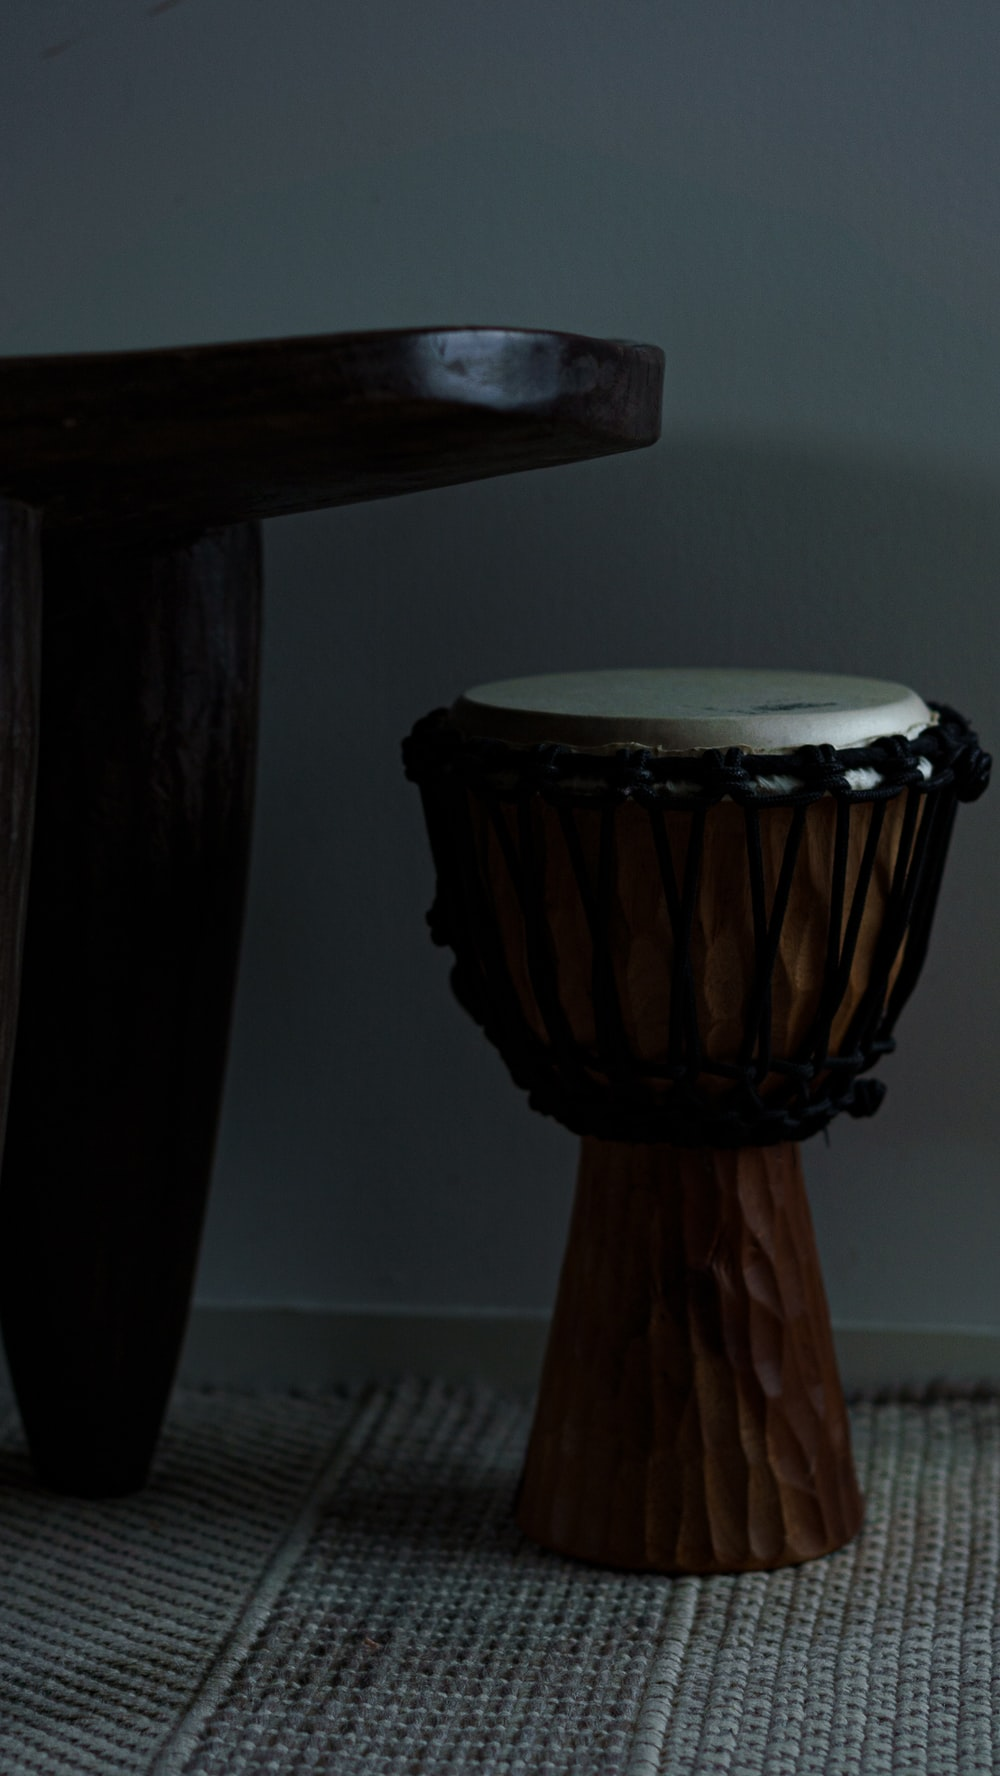 black and white drum near white wall